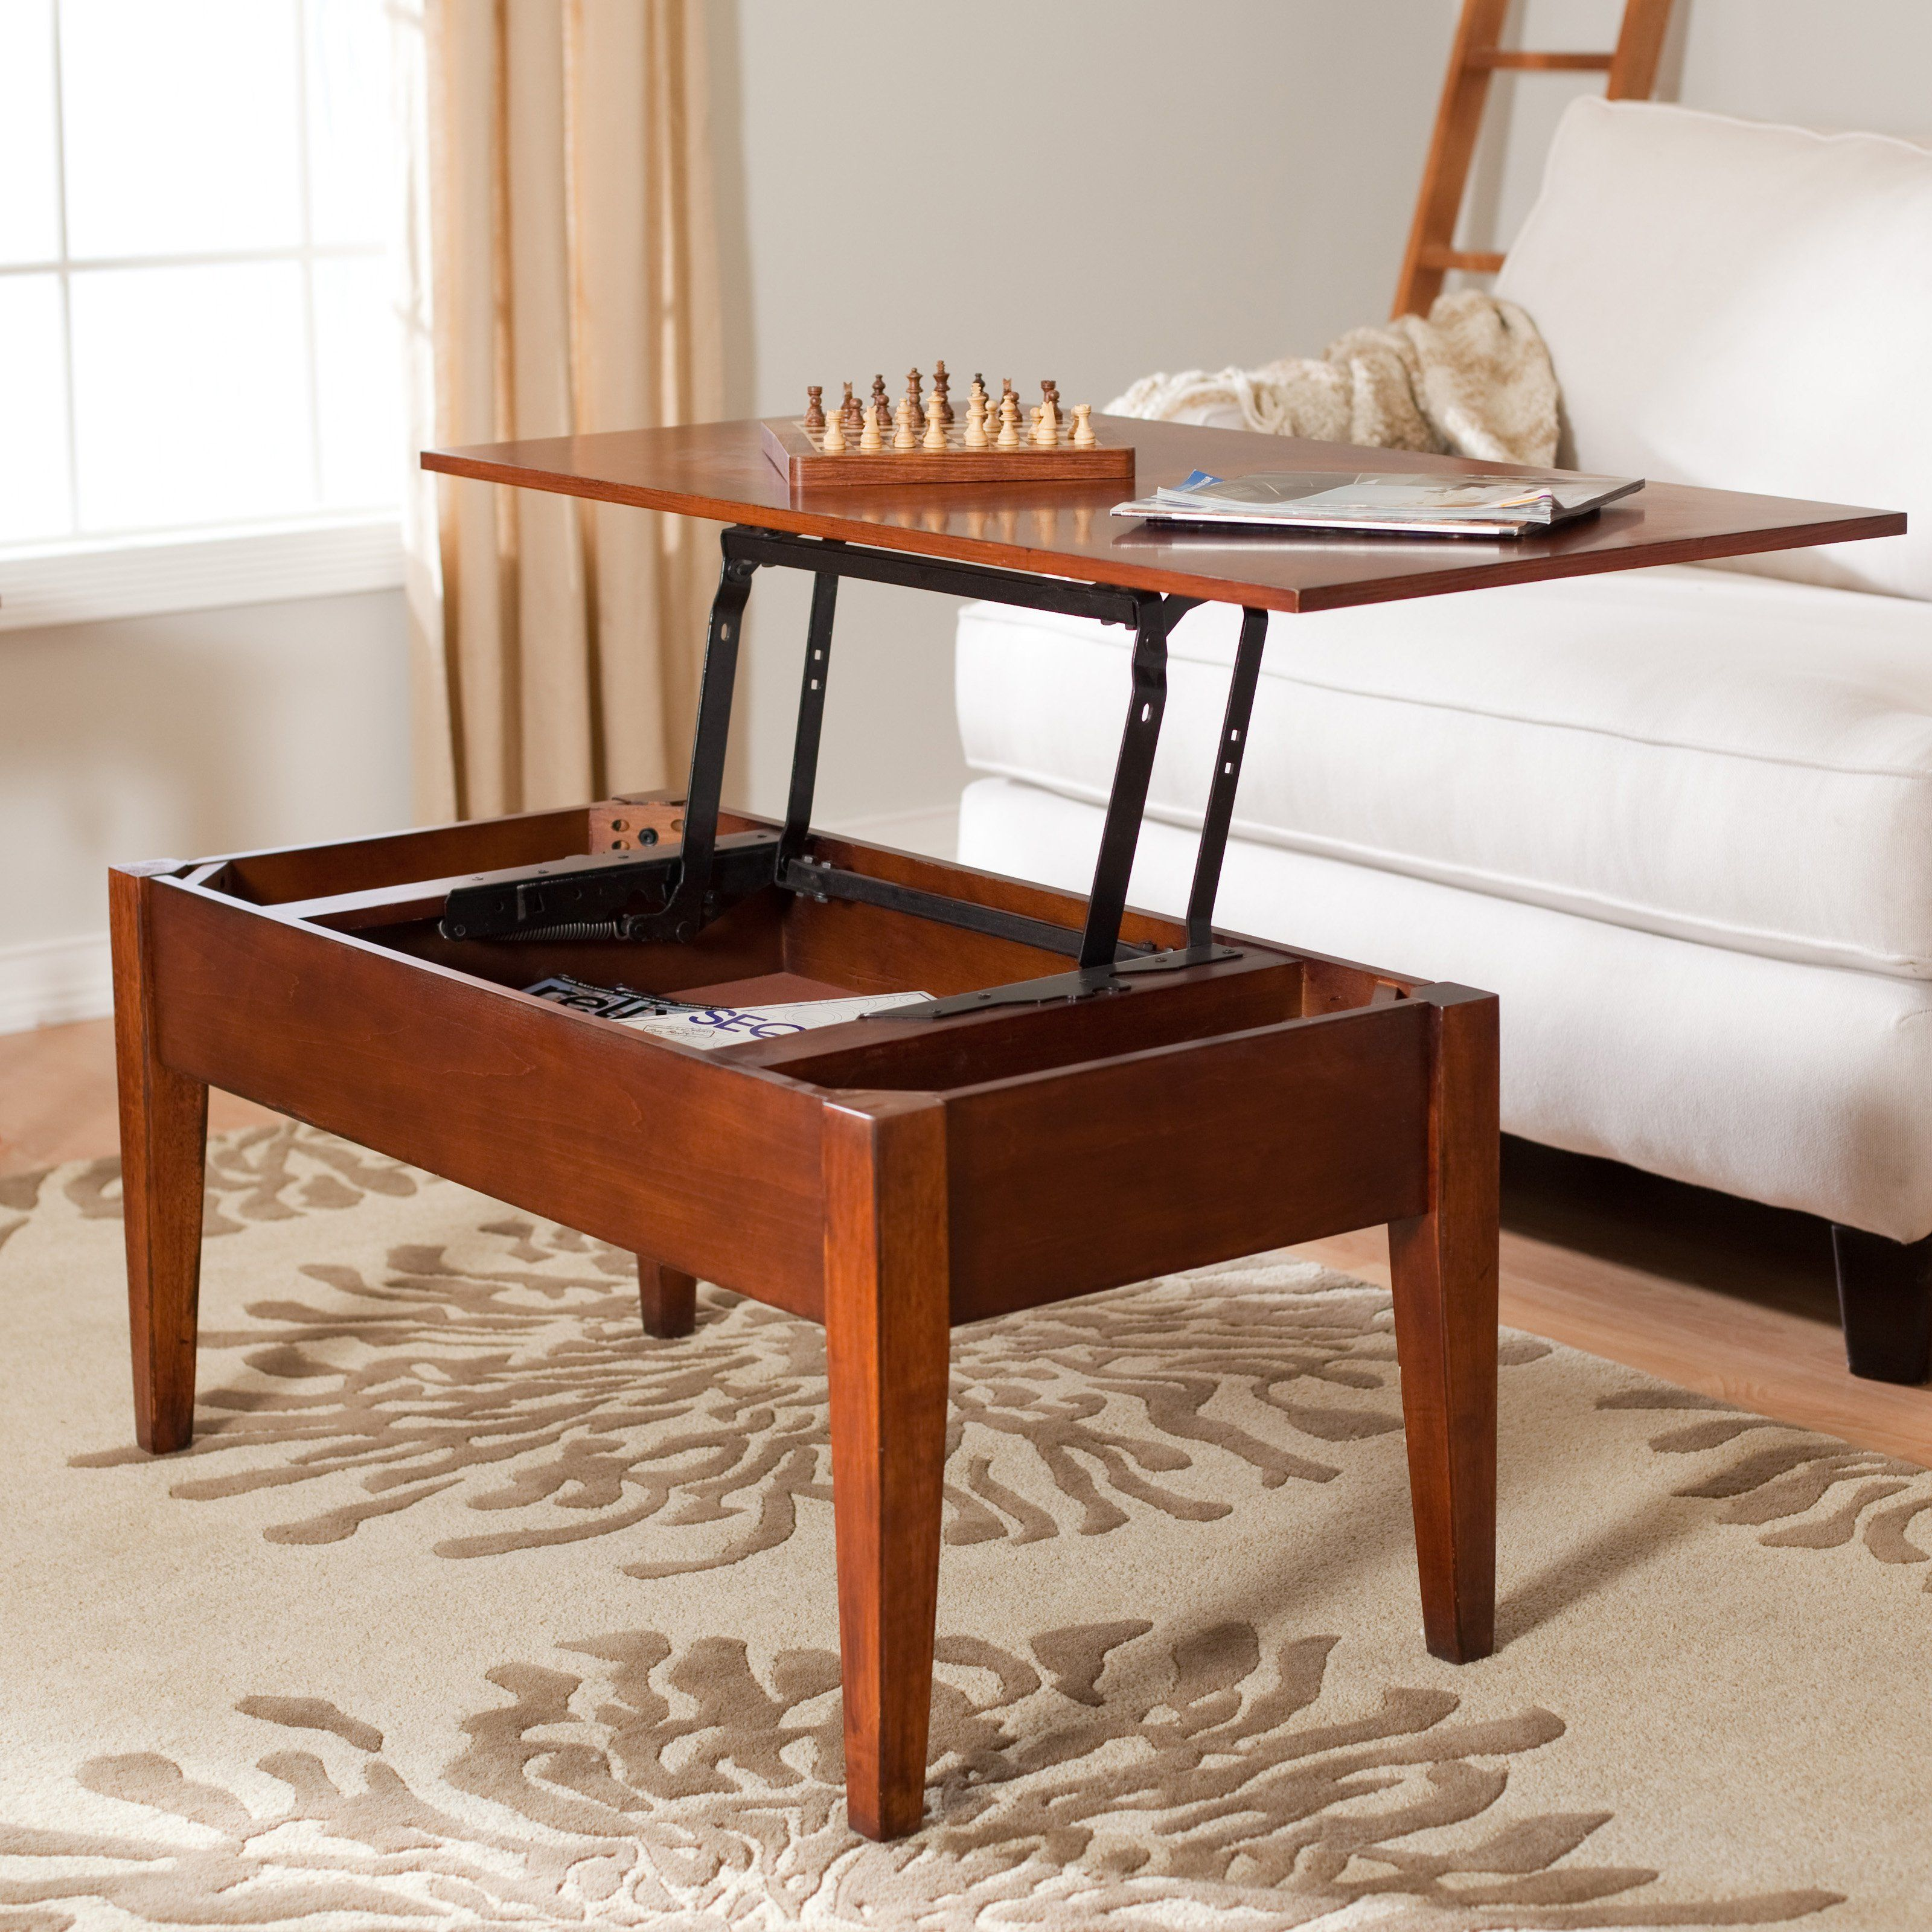 Turner Lift Top Coffee Table Oak 159 98